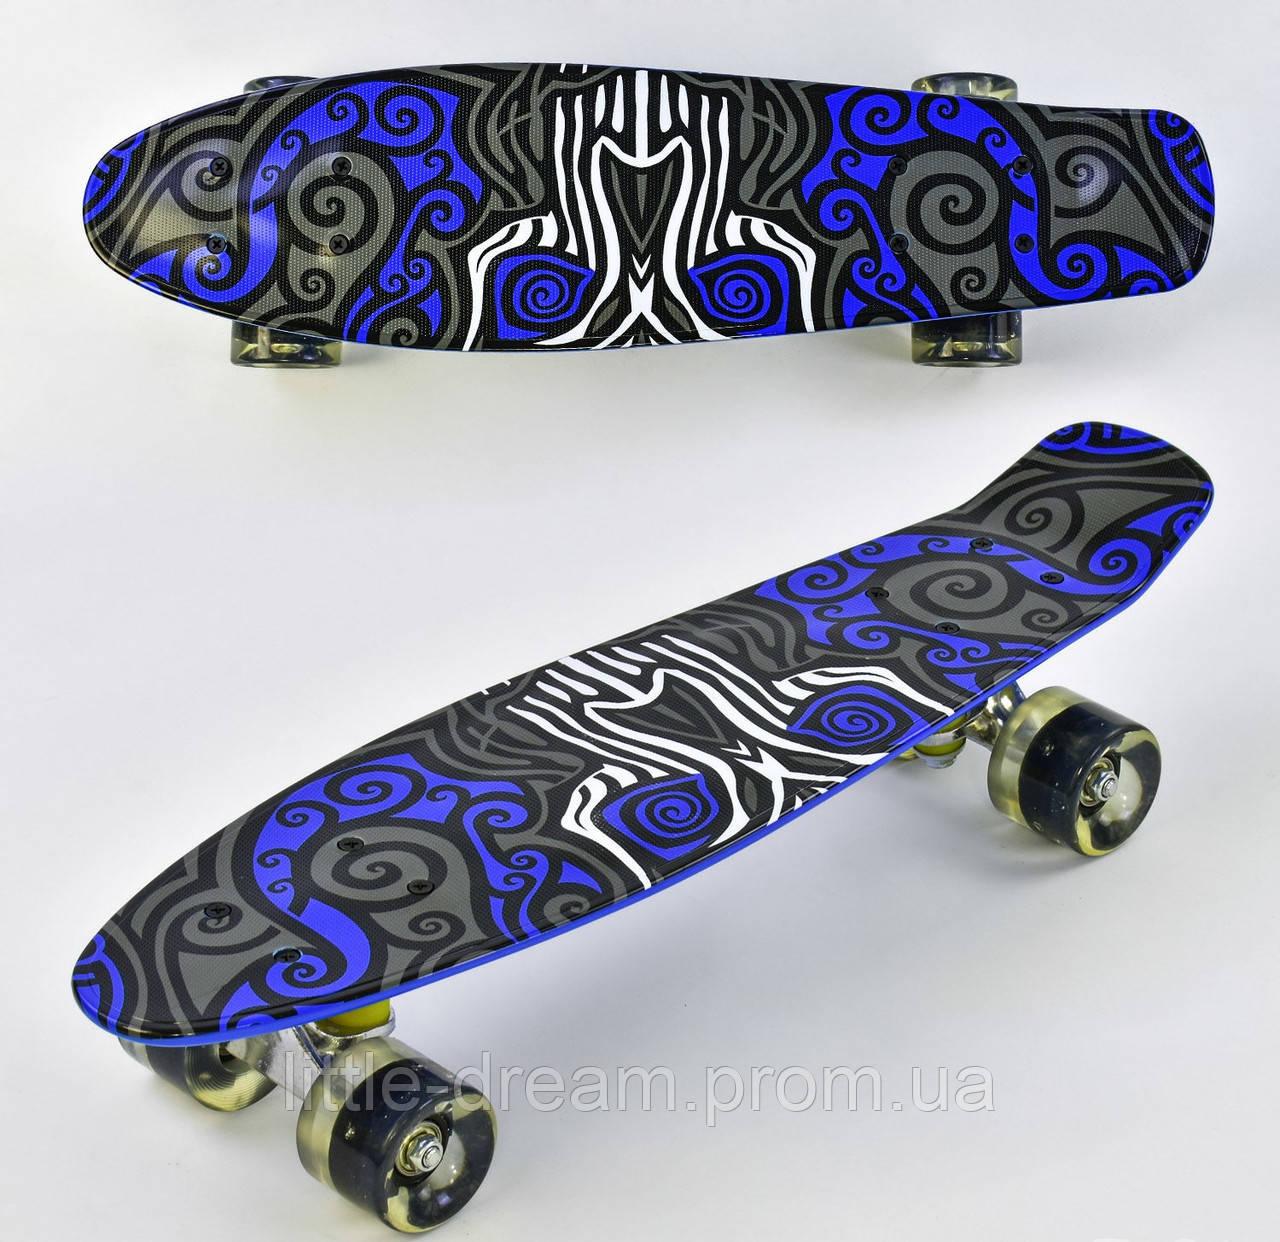 Пенниборд ( Скейтбород ) детский лонгборд  Penny board  Пенни борд абстракция синий со светящимися колесами